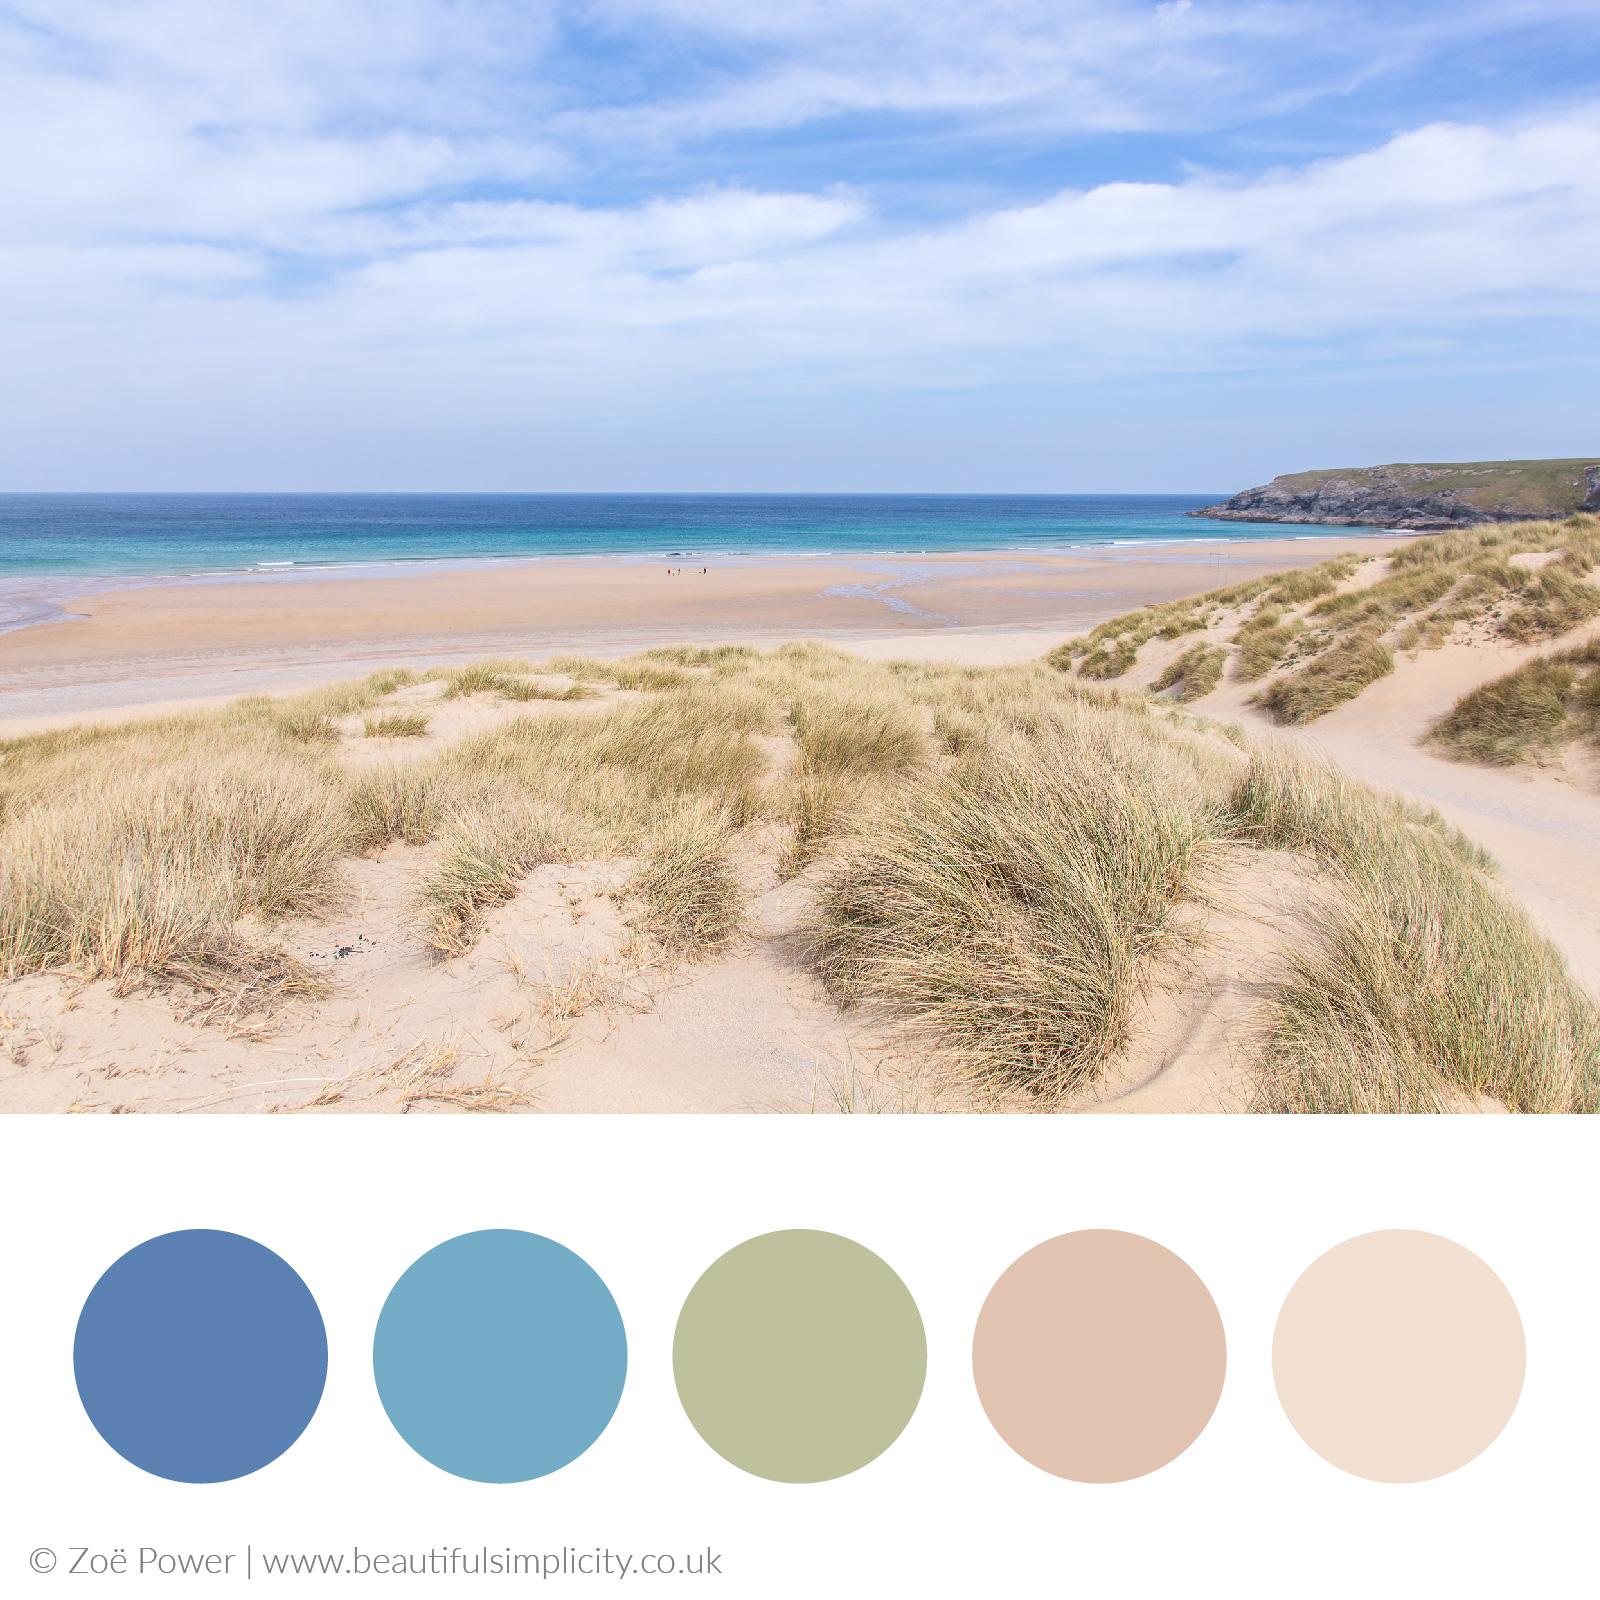 Sea, sky and sand dunes colour palette   Holywell beach, Cornwall, UK